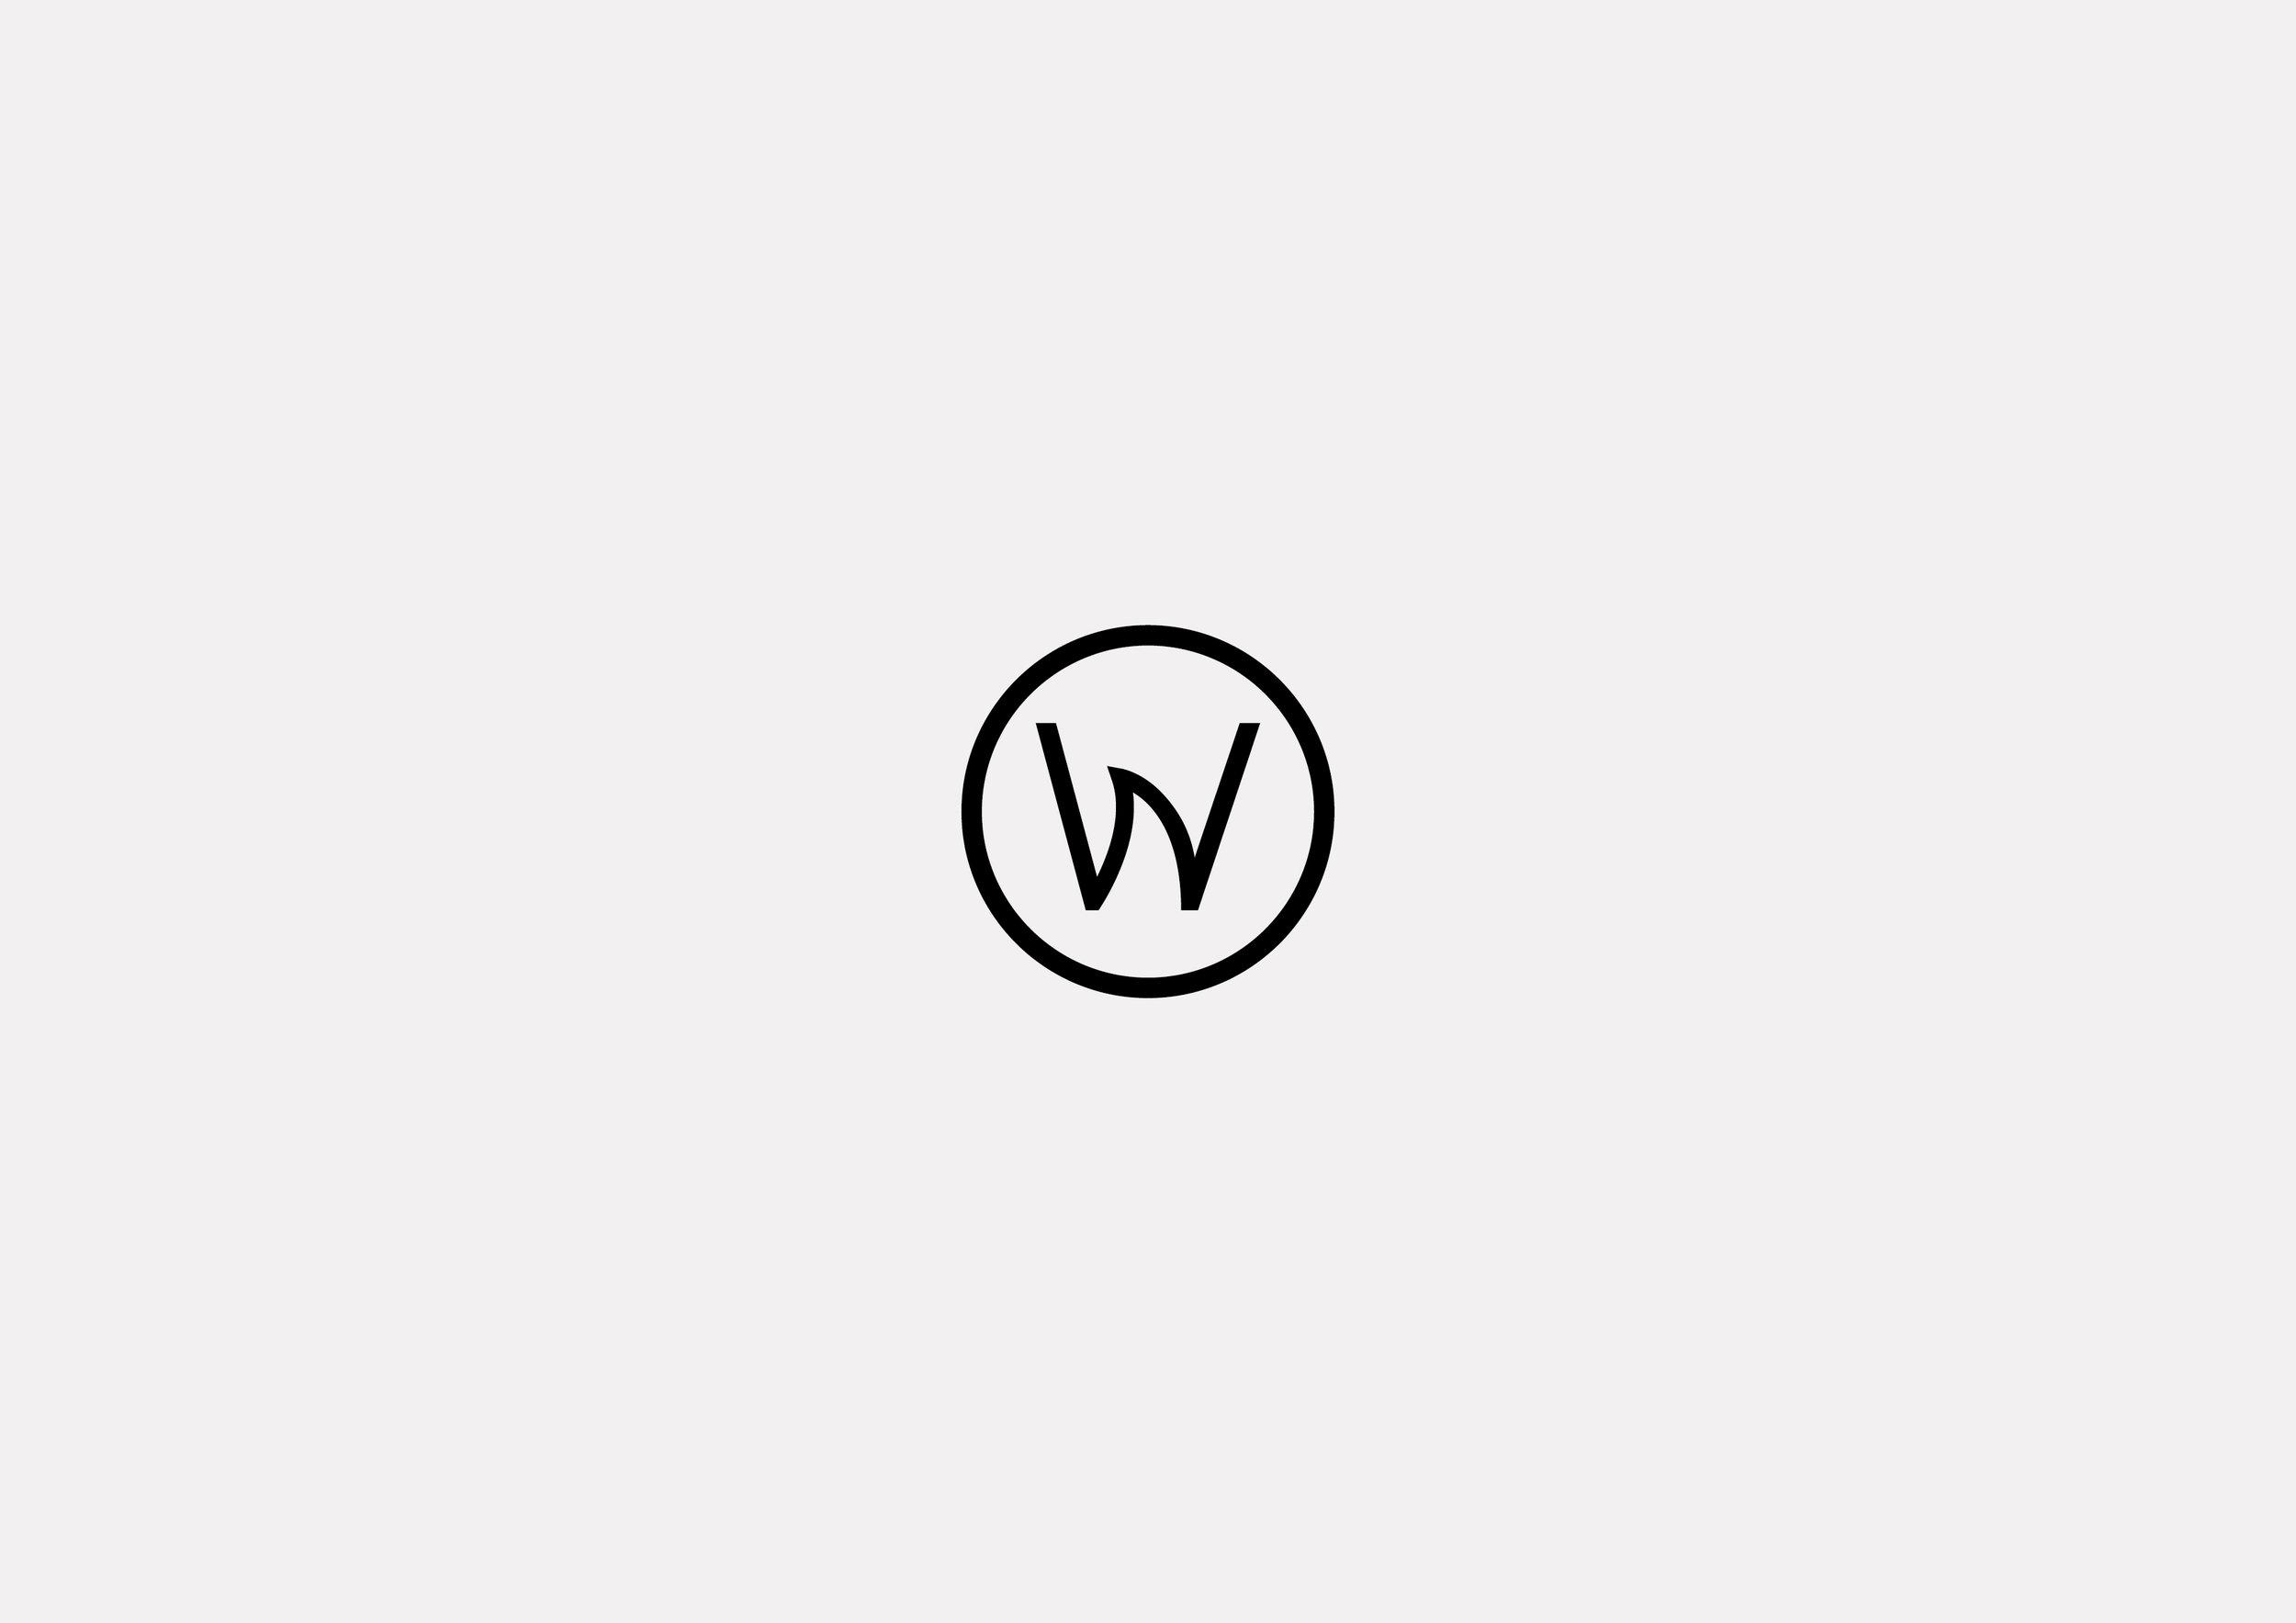 Logos 14-15-02.jpg